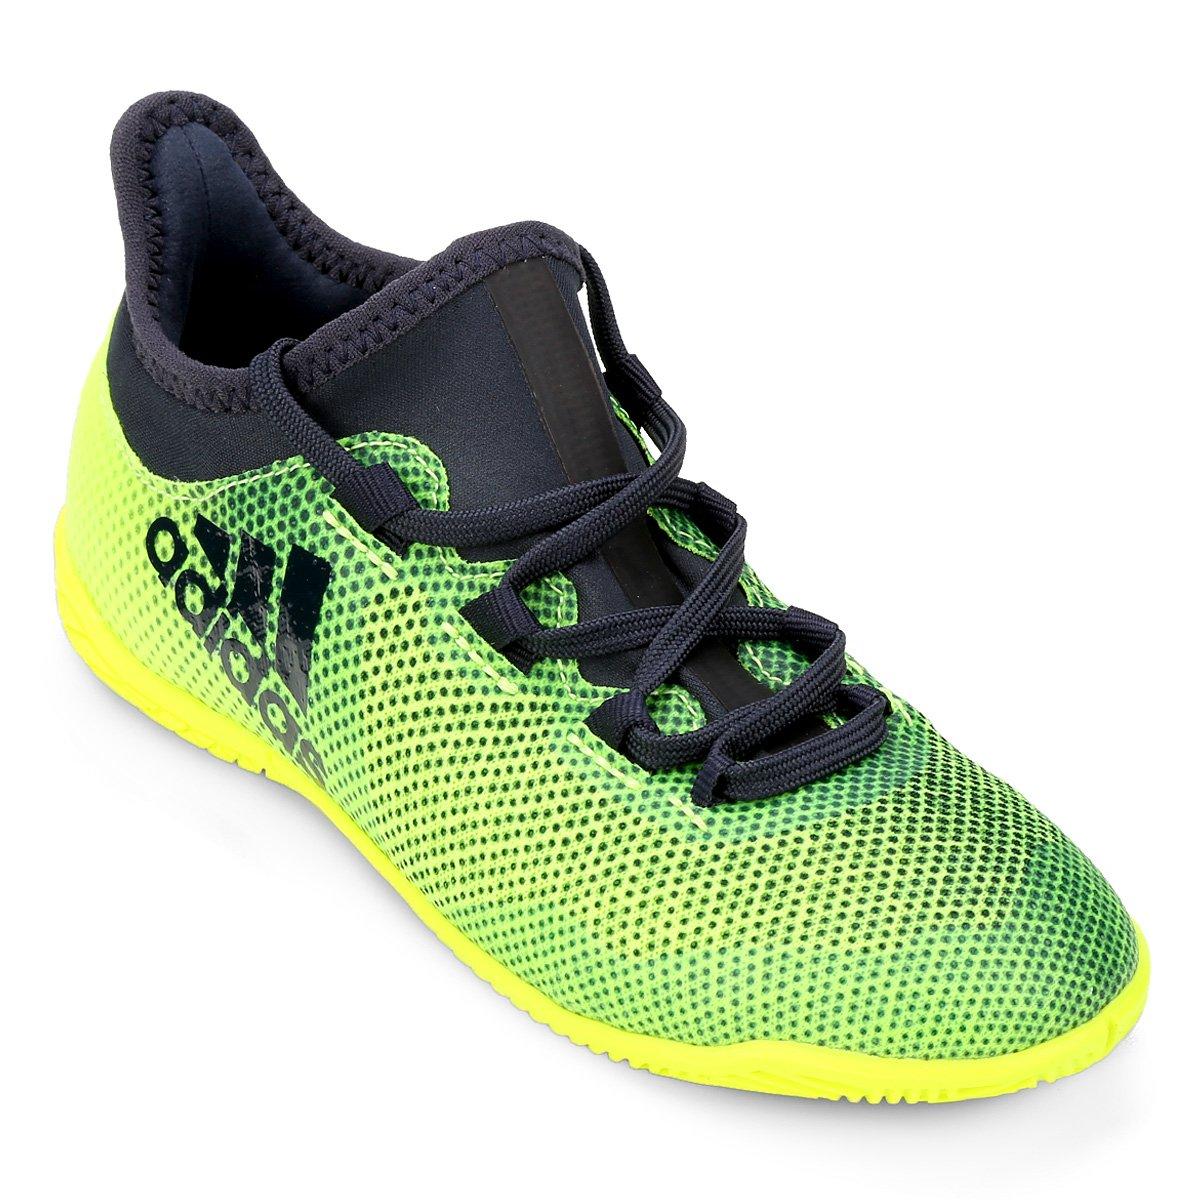 3c67d18637 Chuteira Futsal Infantil Adidas X 17.3 IN